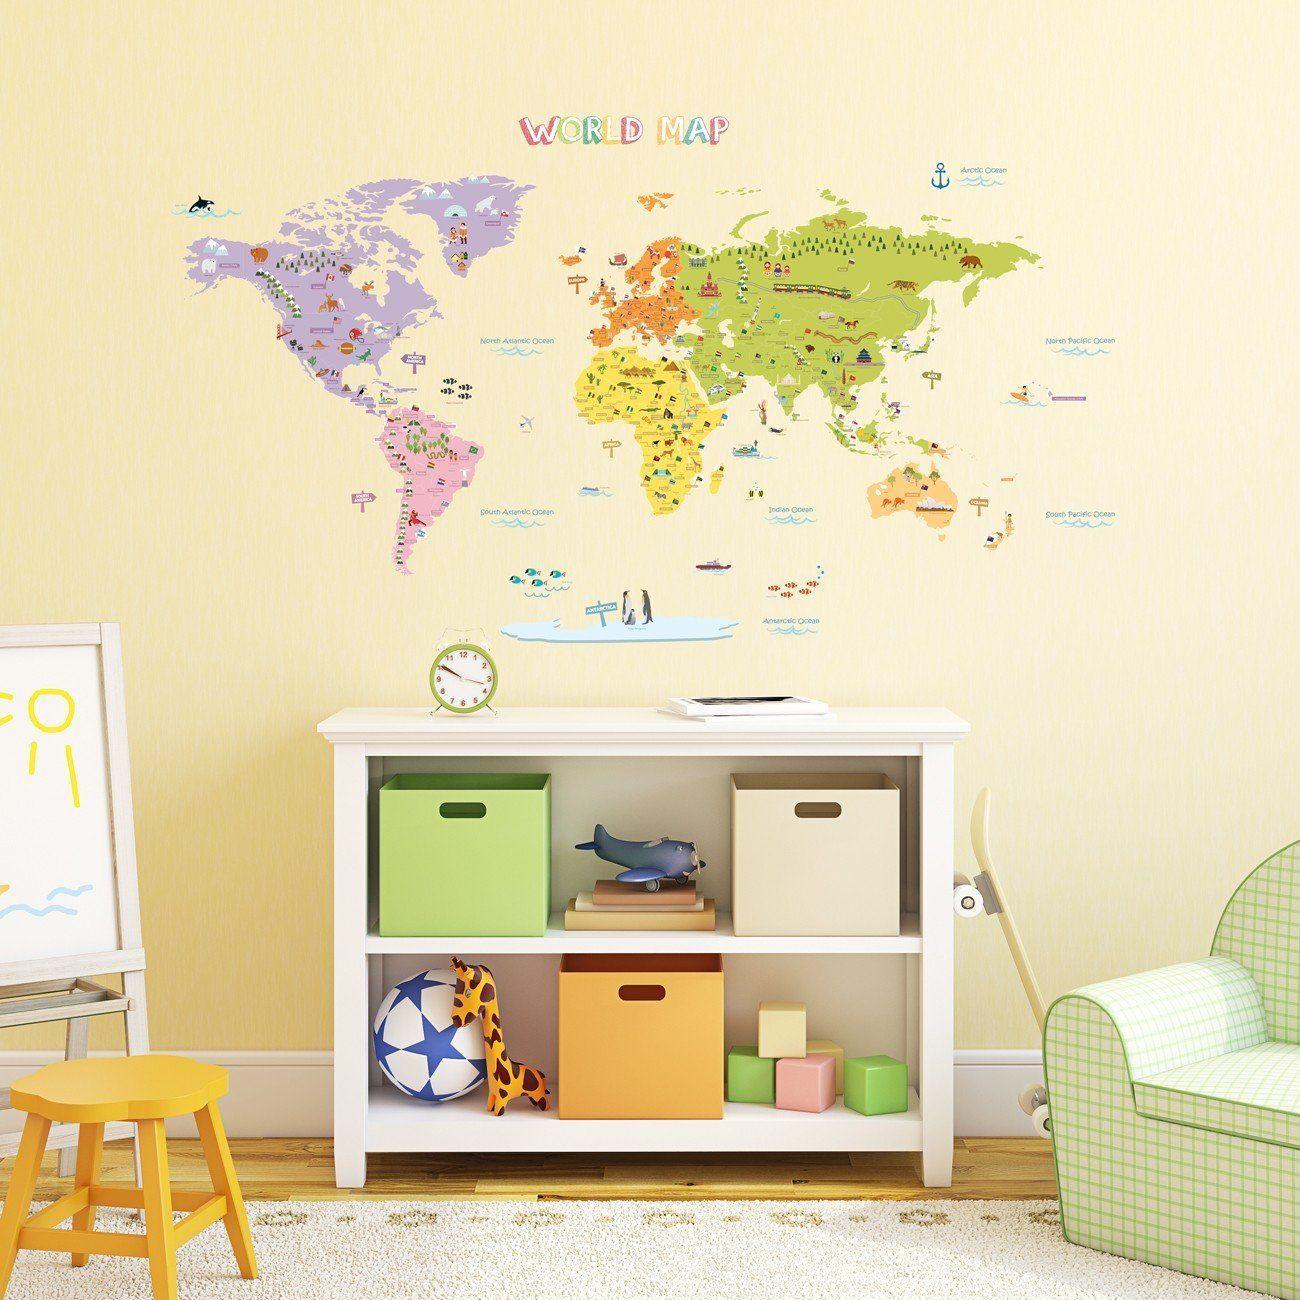 Decowall DMT 1306 Farben Frohe Weltkarte Wandsticker Wandaufkleber Wandtattoo  Kinderzimmer (Groß): Amazon